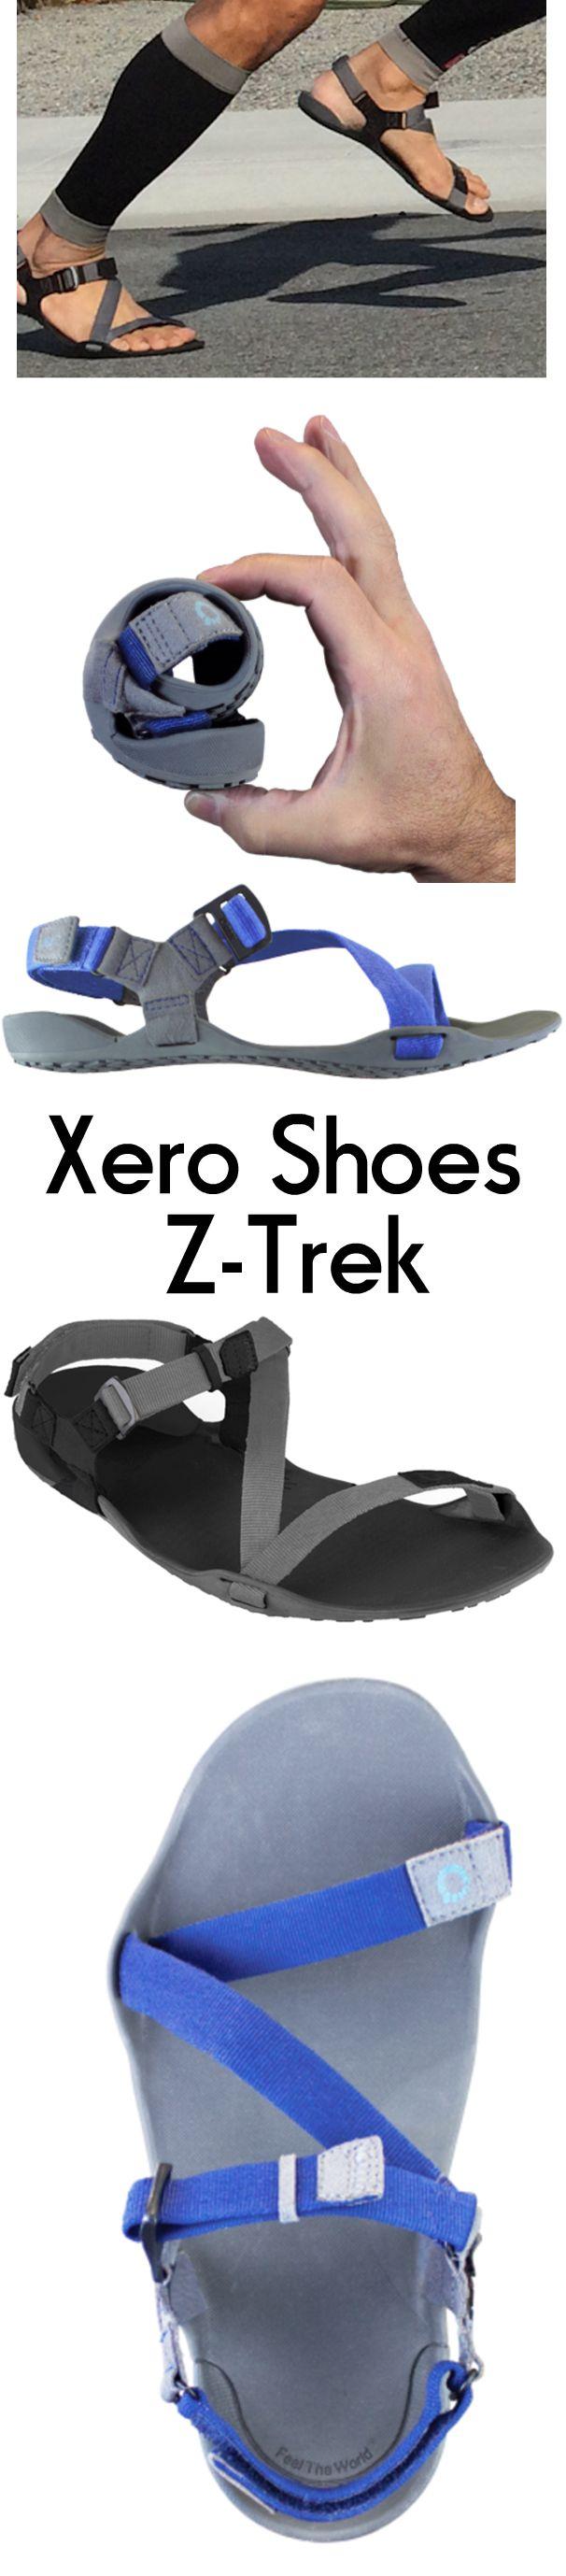 Barefoot Running Sandals - Amuri Z-Trek by Xero Shoes